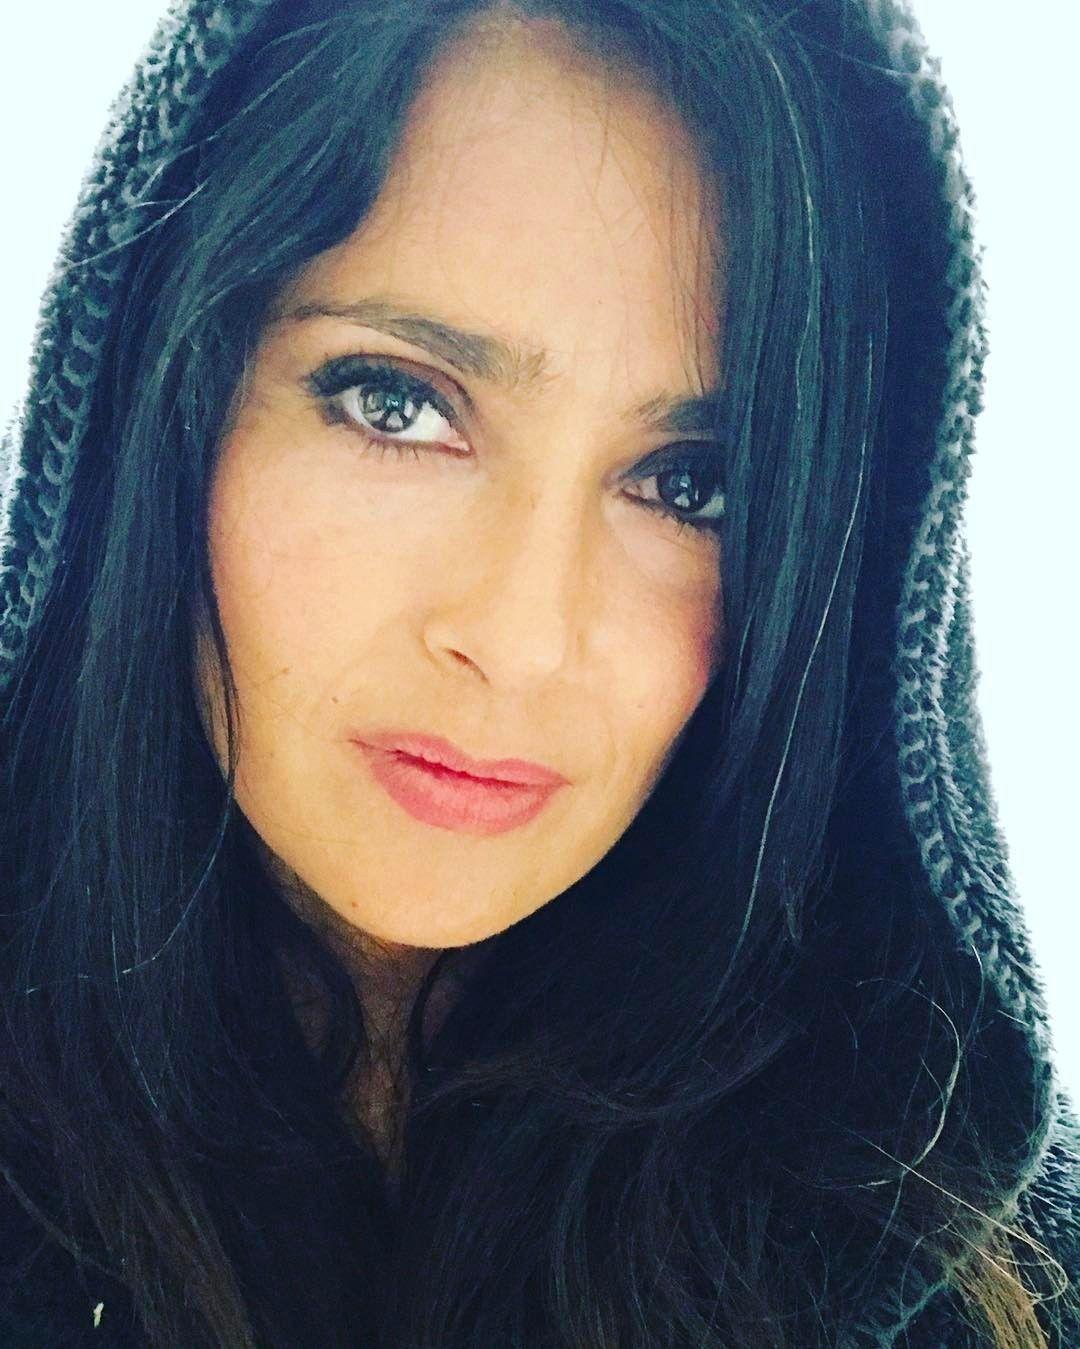 Selfie Salma Hayek nude (67 photo), Topless, Hot, Selfie, underwear 2018